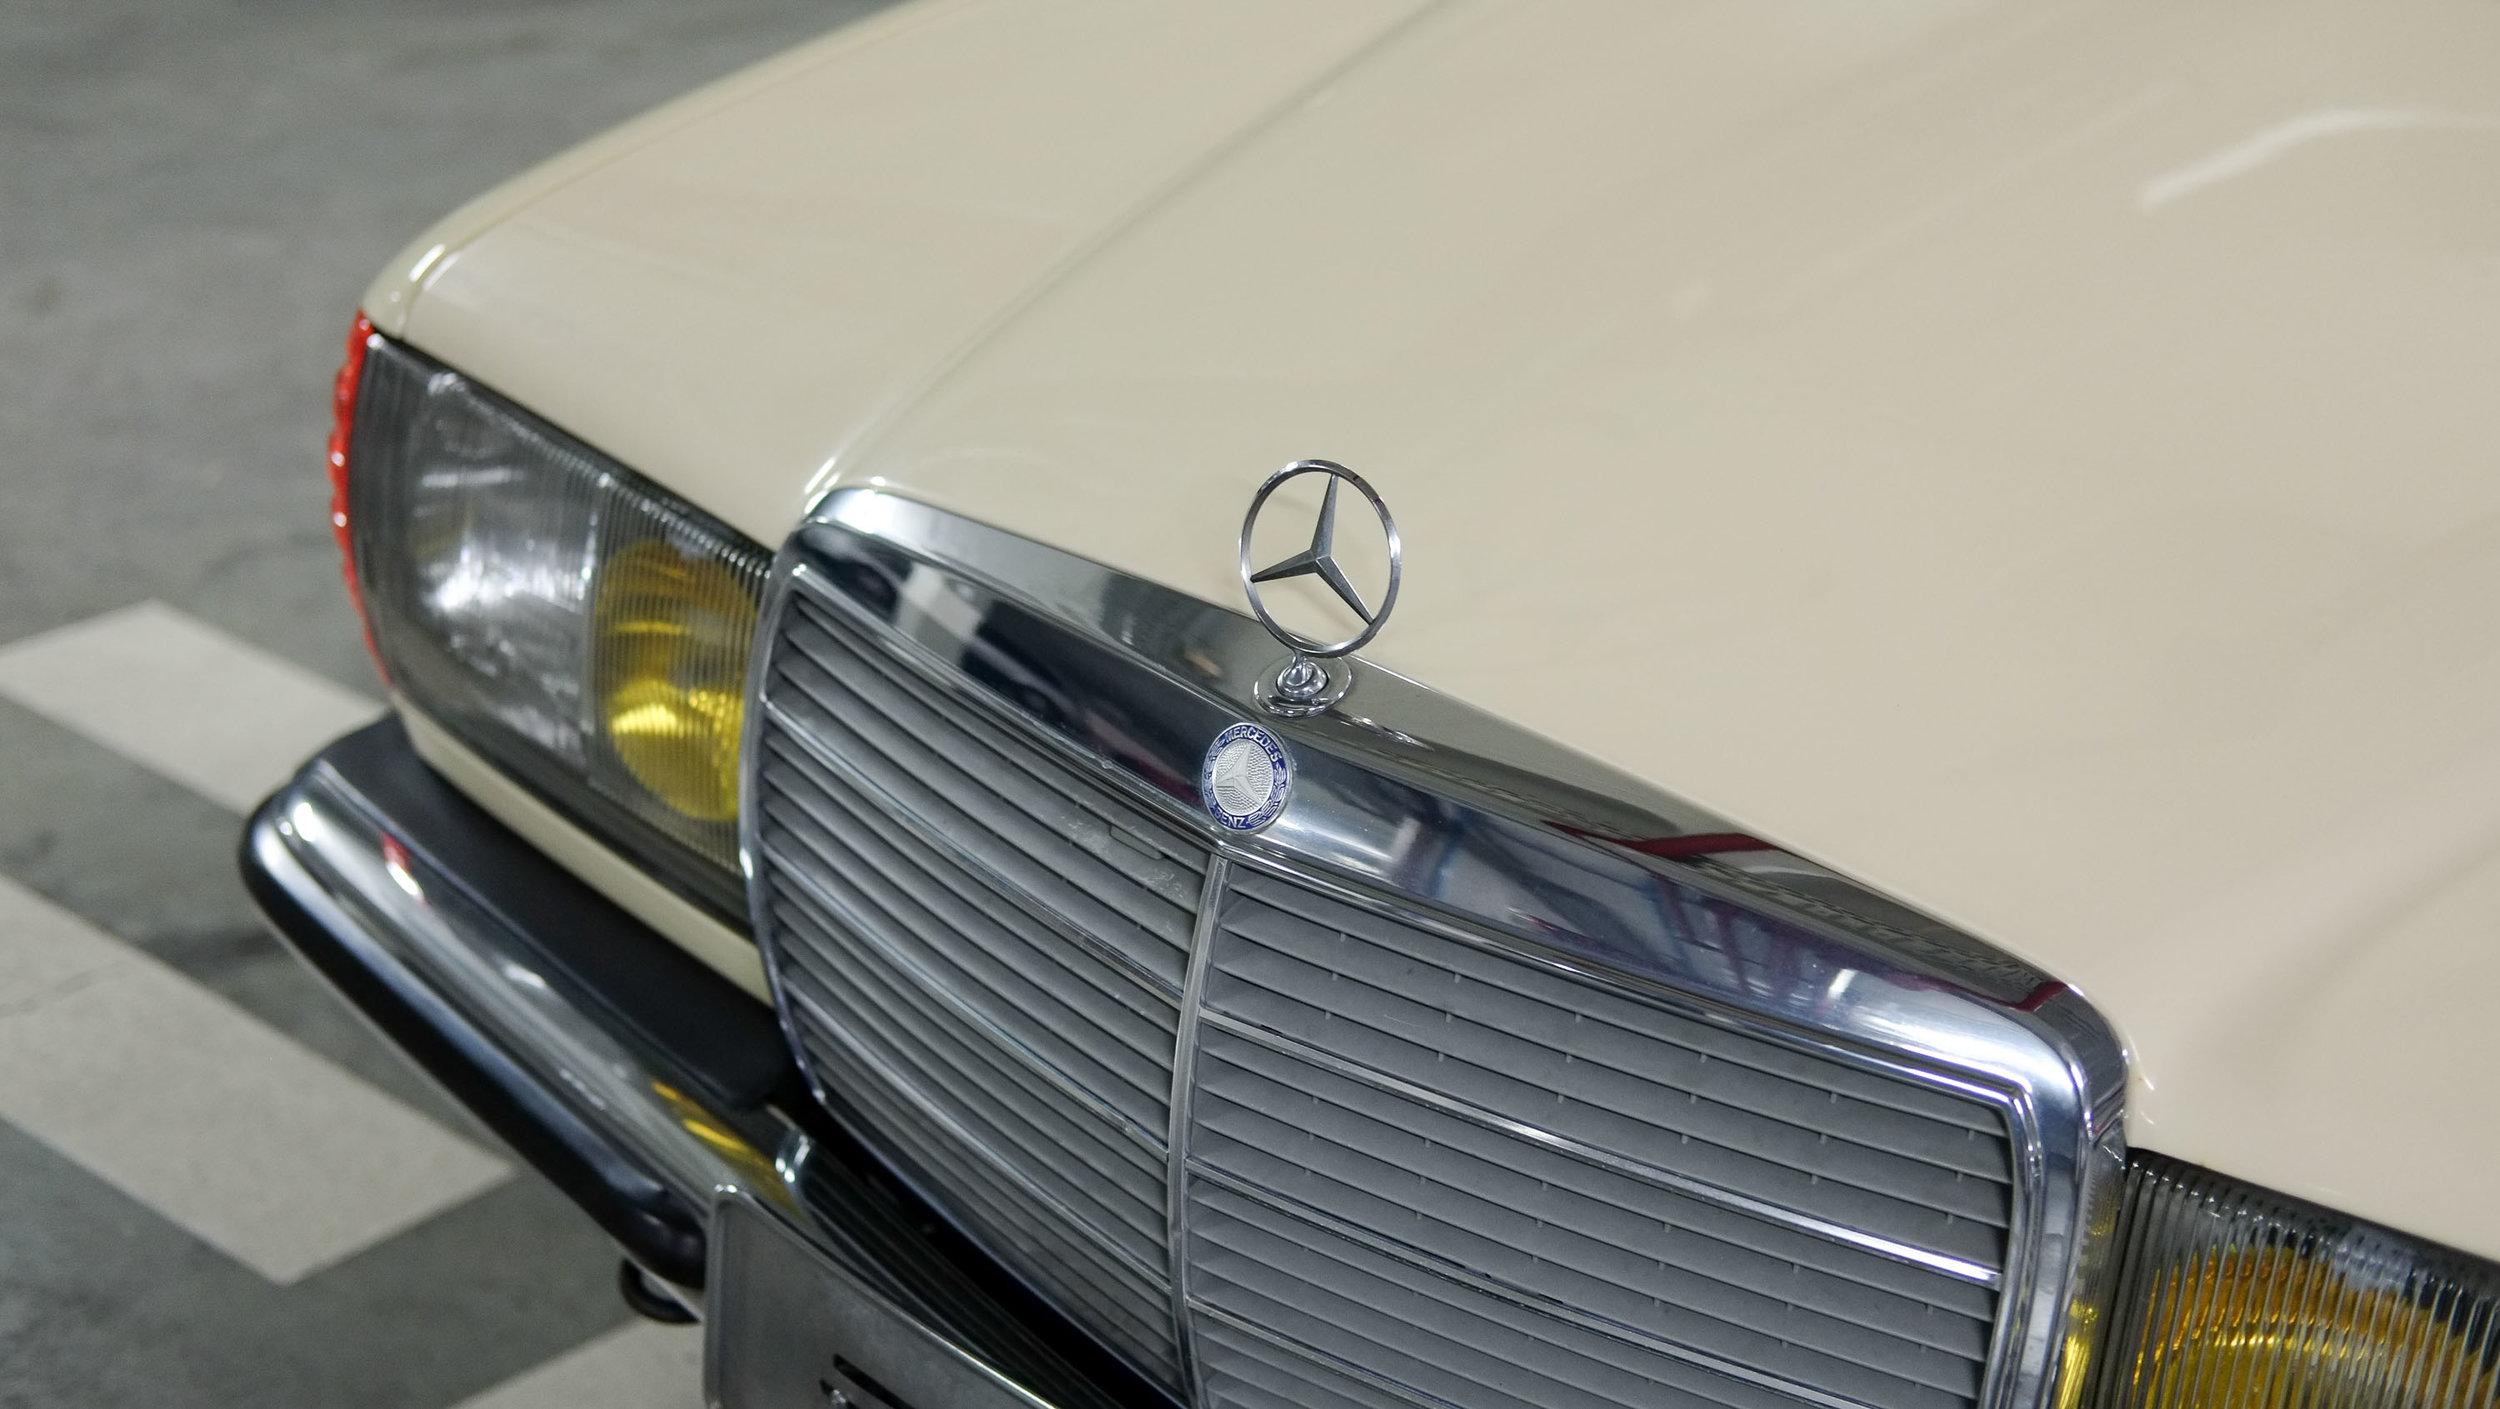 coolnvintage Mercedes-Benz W123 300D (26 of 59).jpg